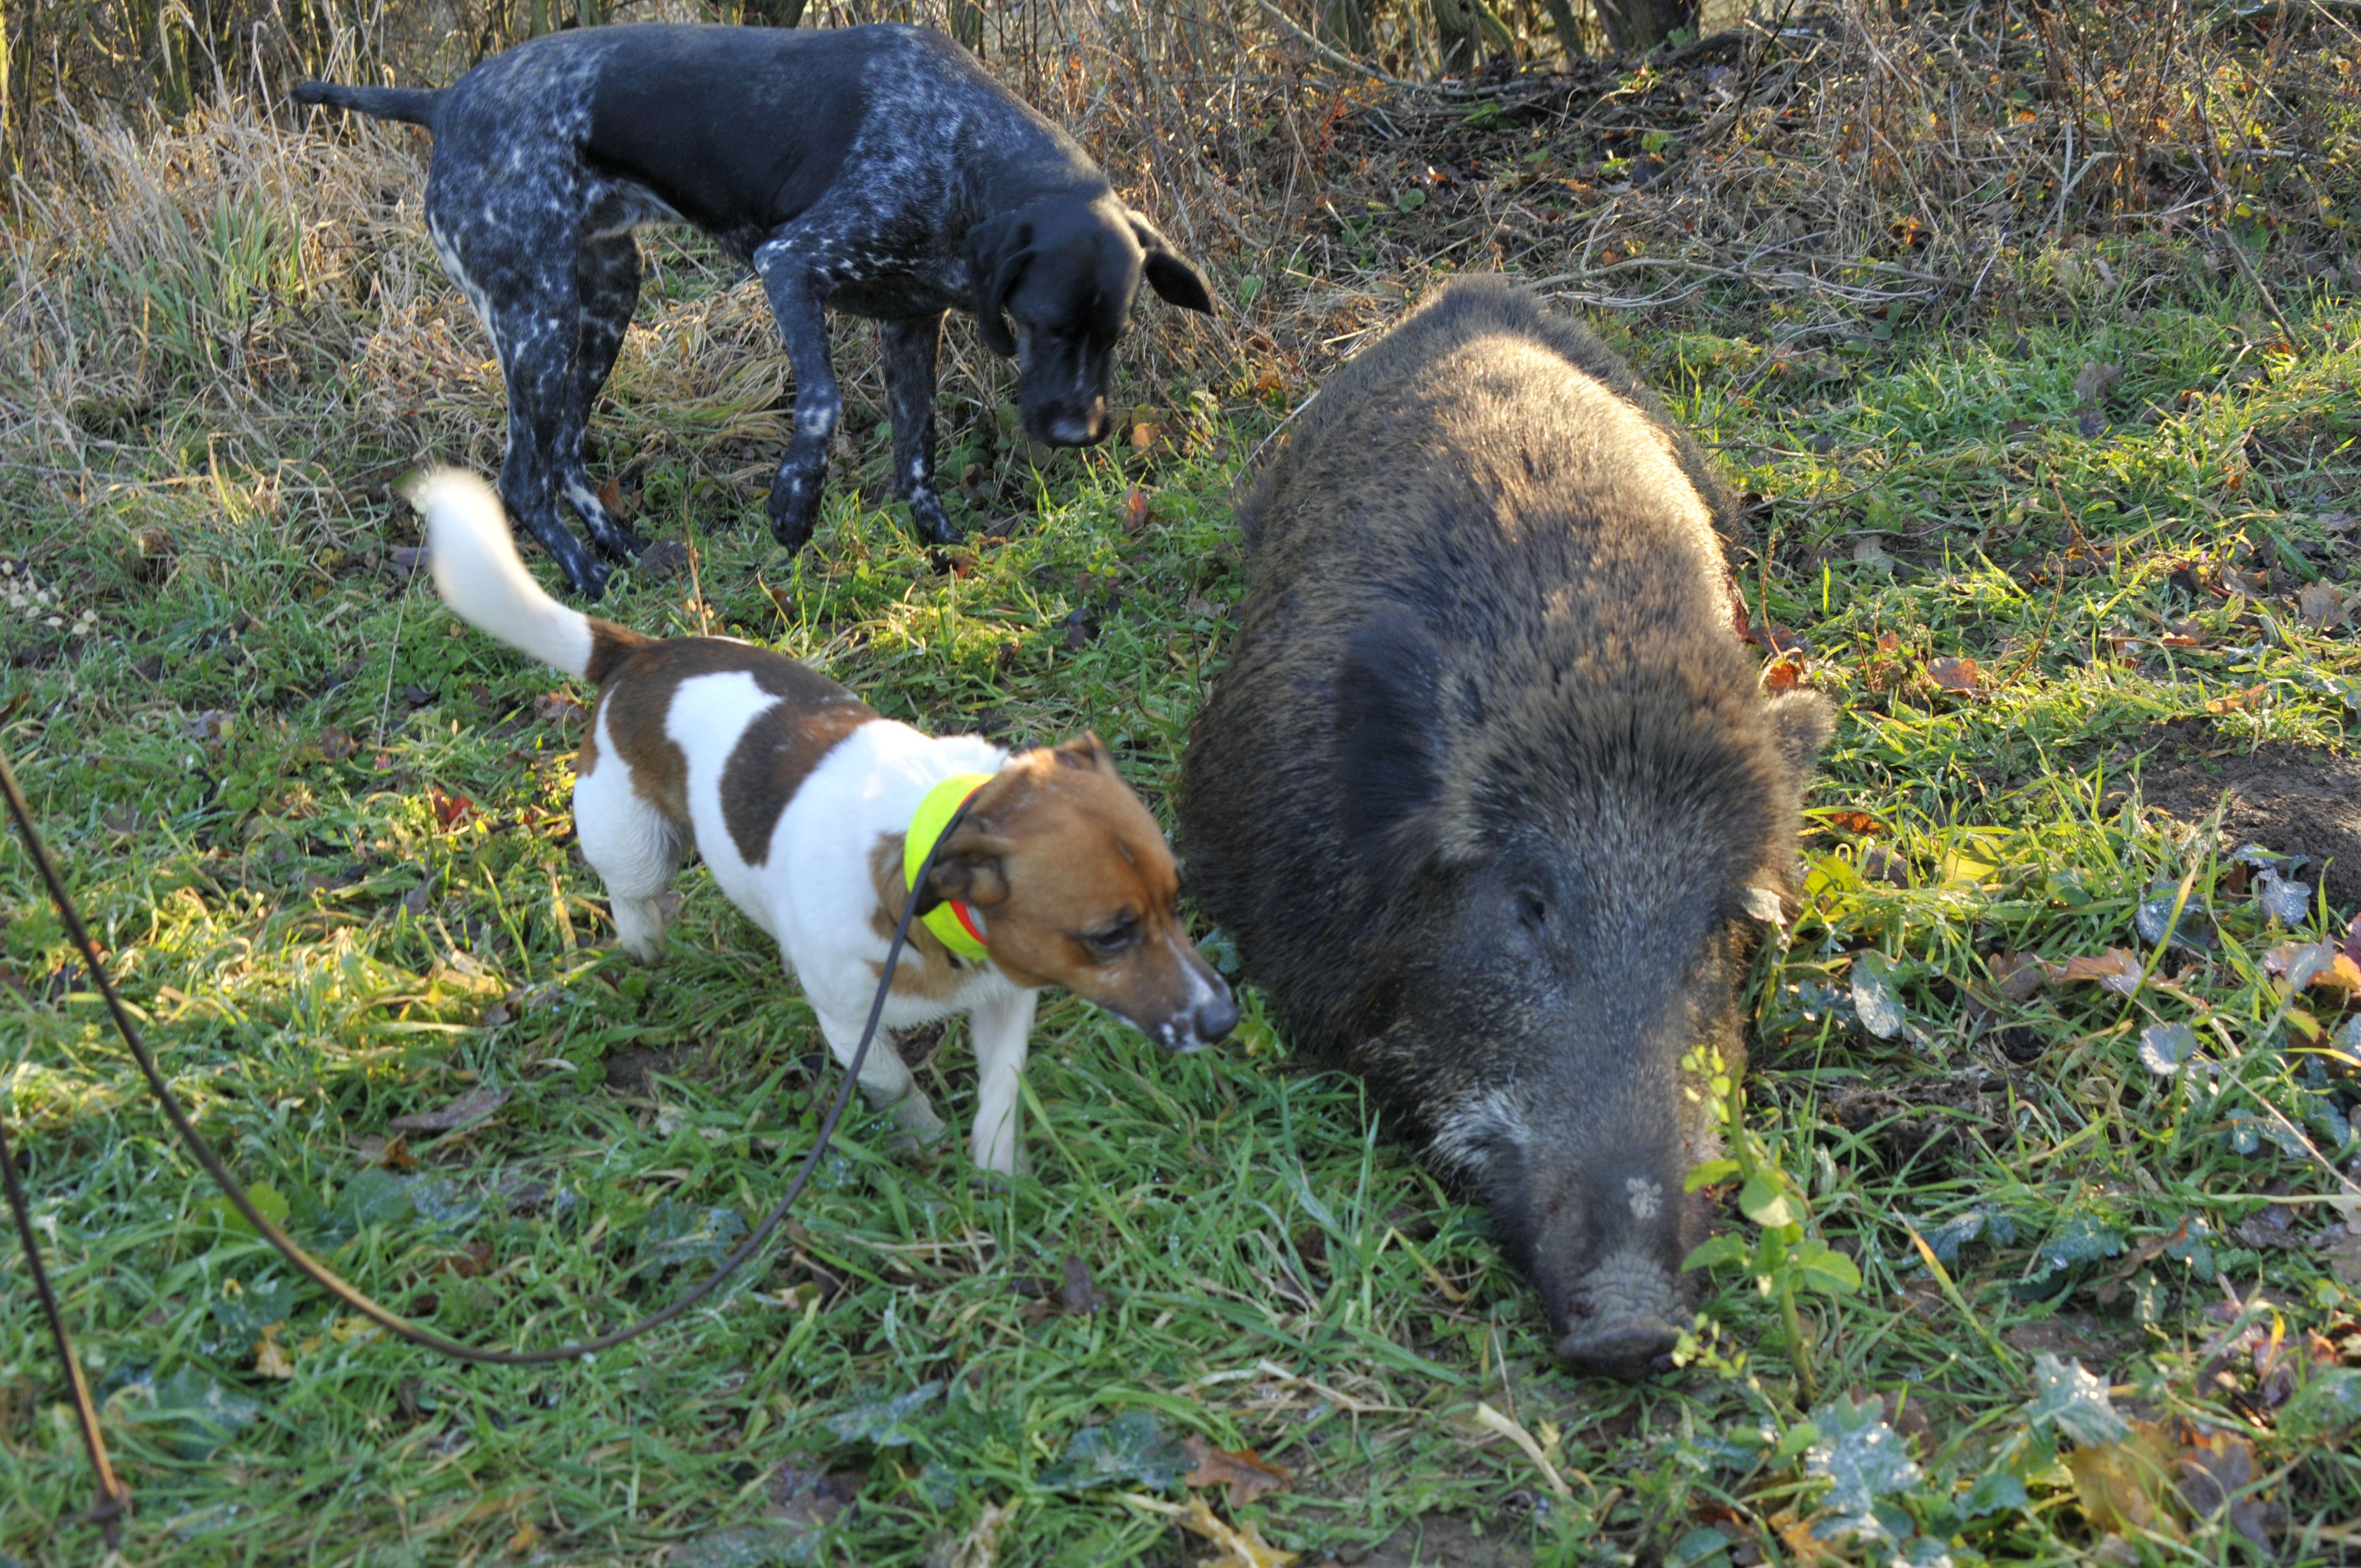 Jagdhunde an geschossener Wildsau HeidlerJagd jagen jäger jaegermagazin jagdtrieb